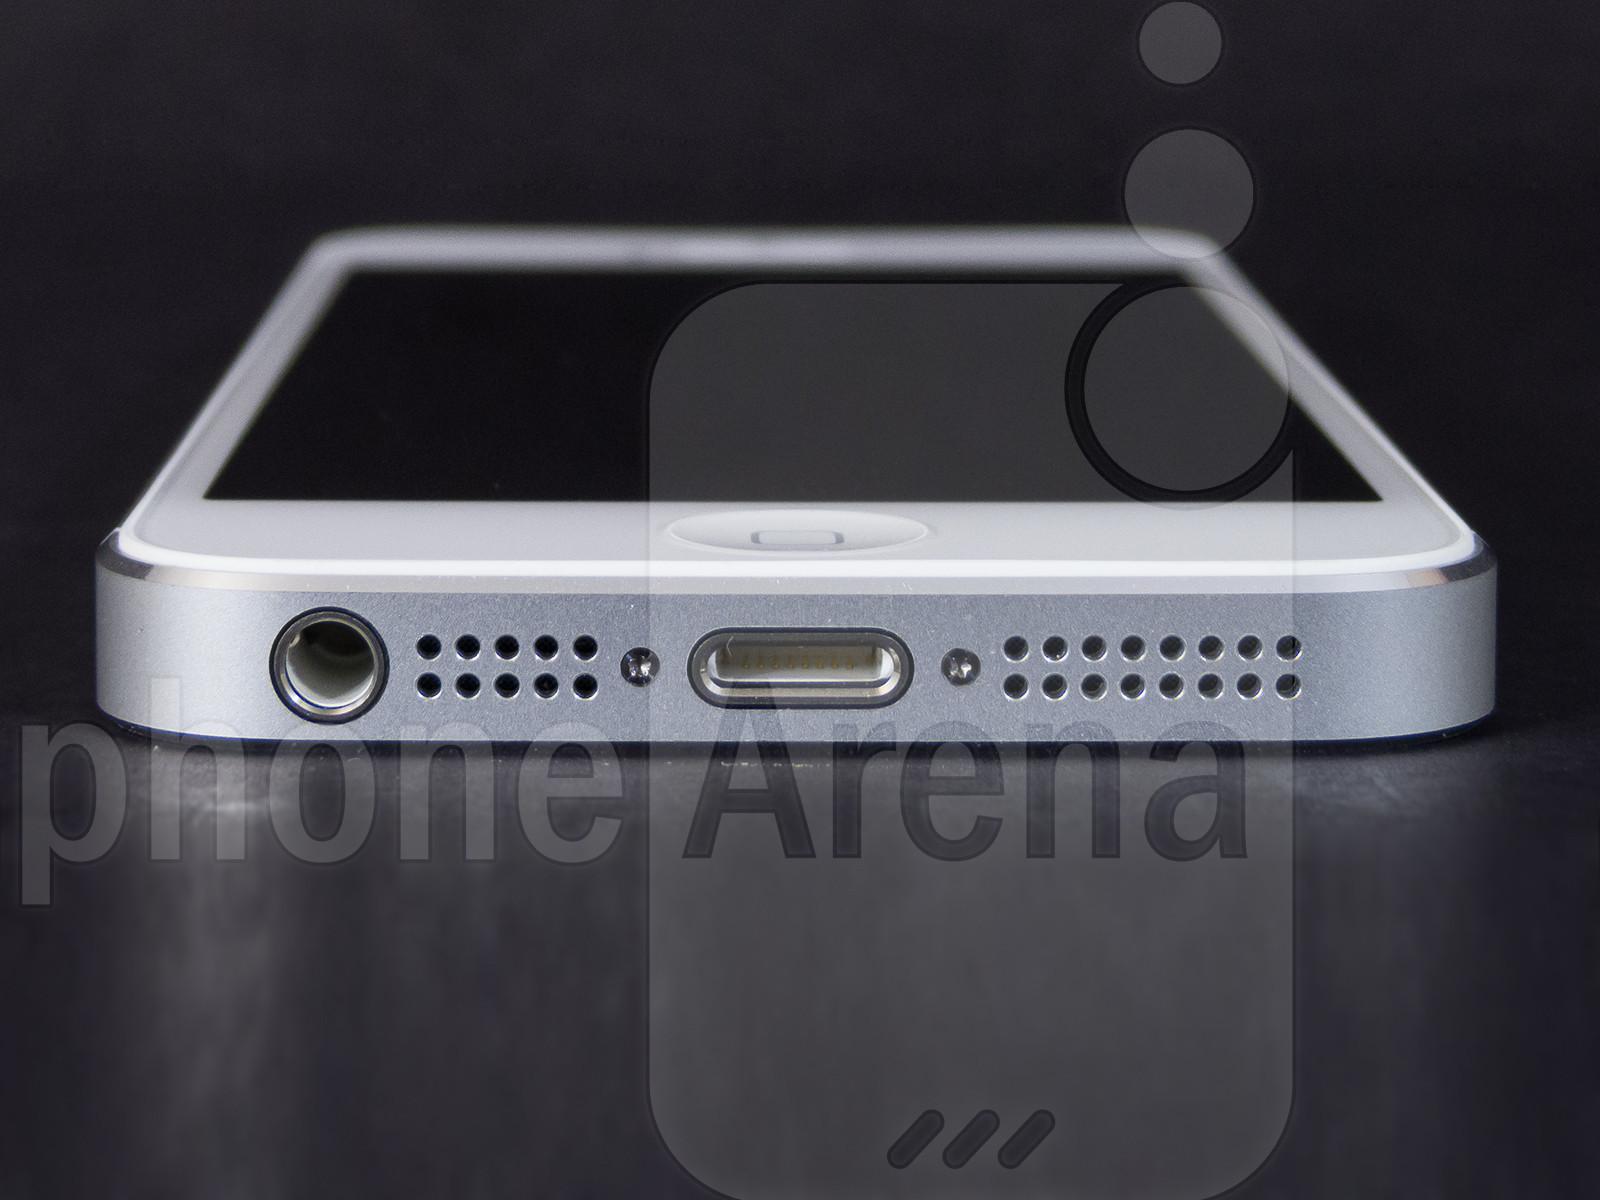 Apple iPhone 5 11